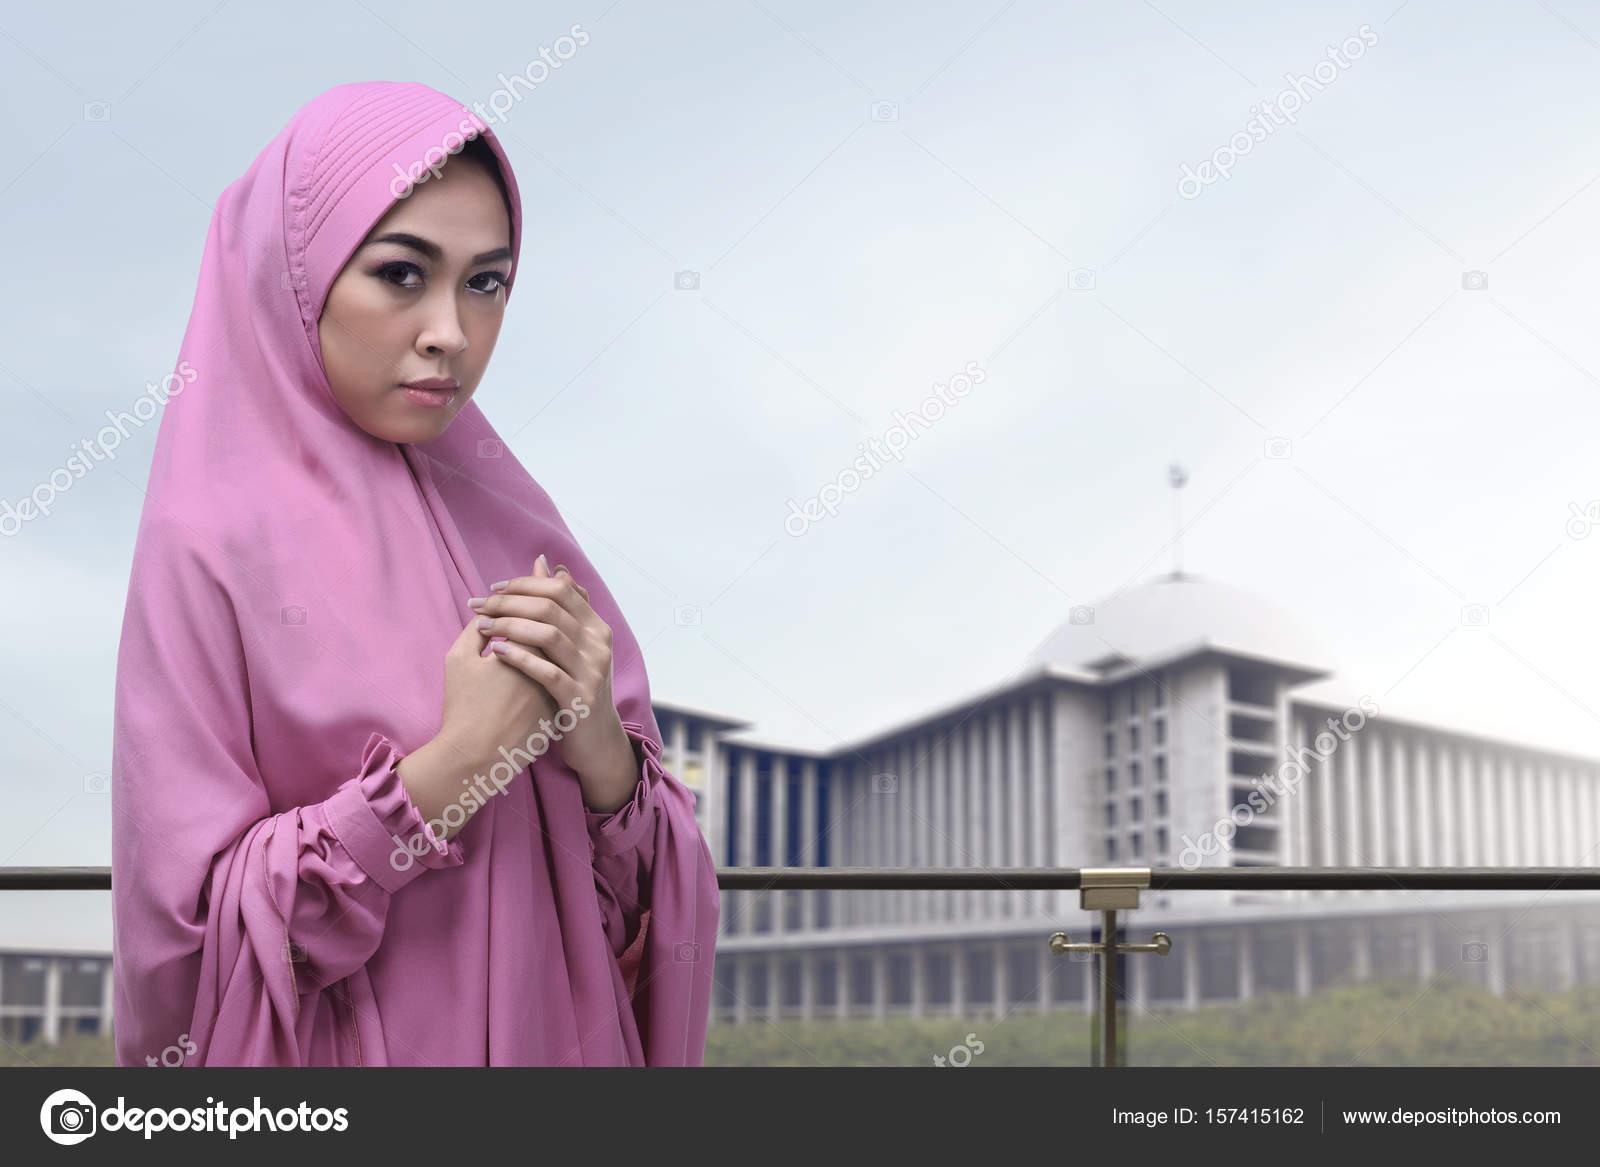 abf1f62b62c depositphotos 157415162-stock-photo-pretty-asian-muslim-woman-in.jpg